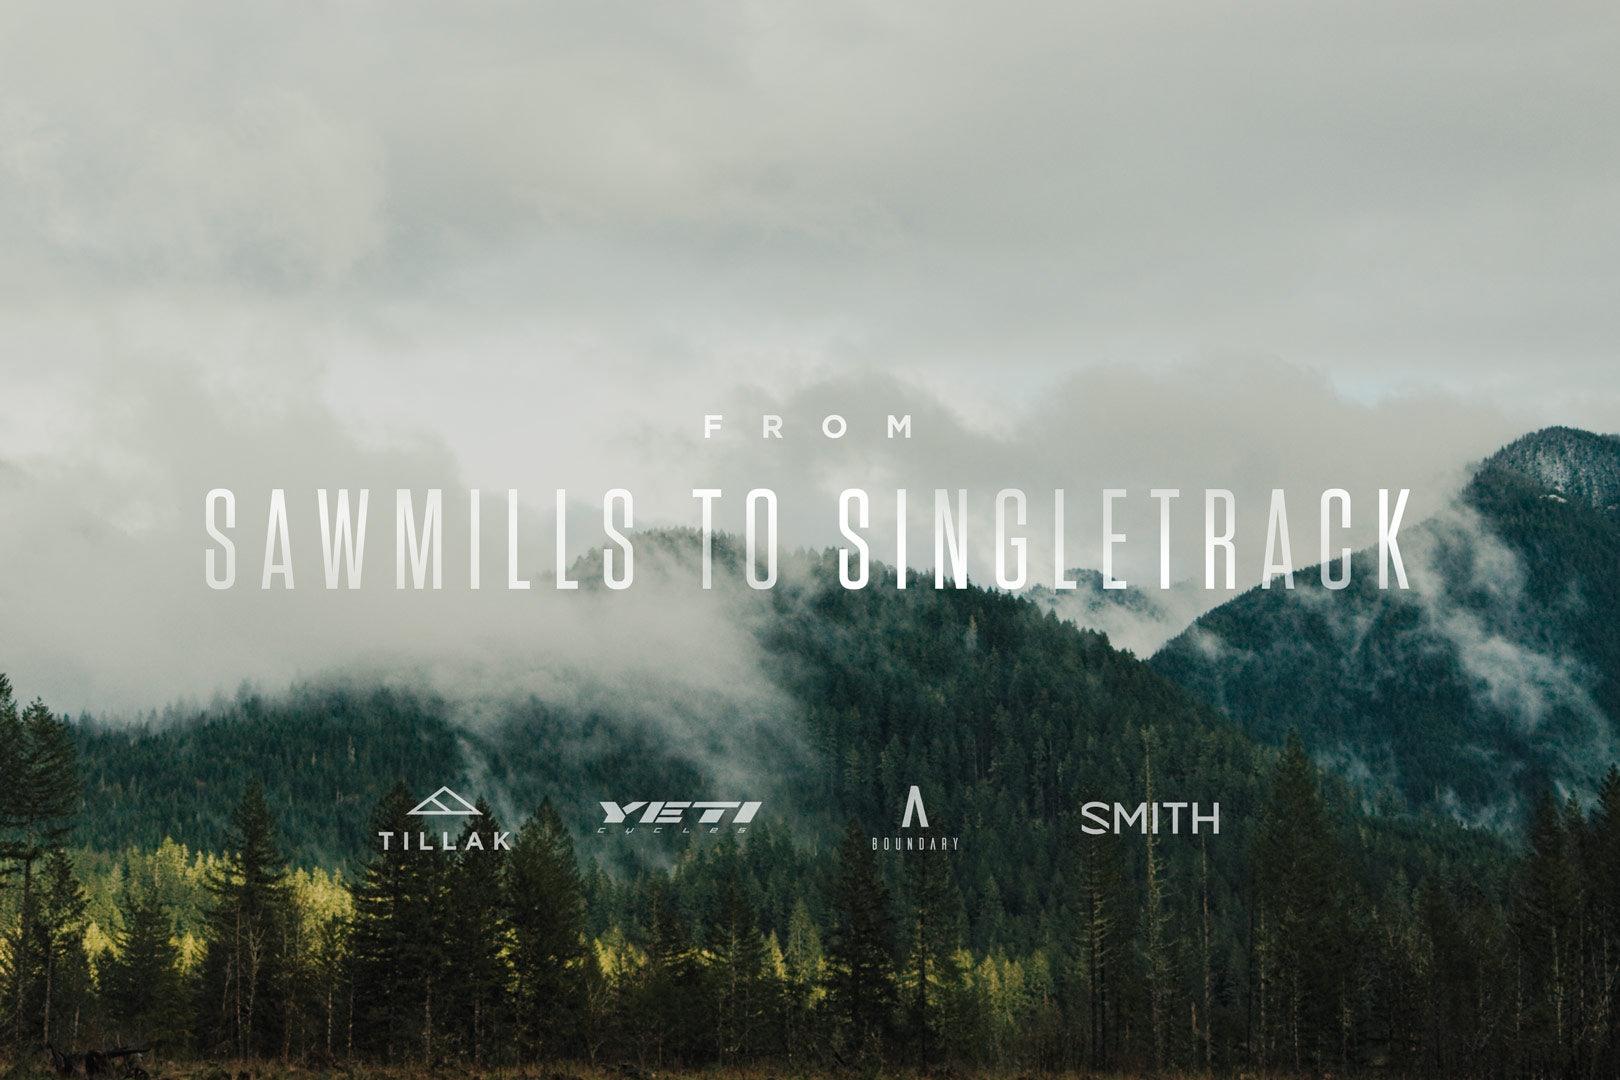 Tillak - From Sawmills to Singletrack